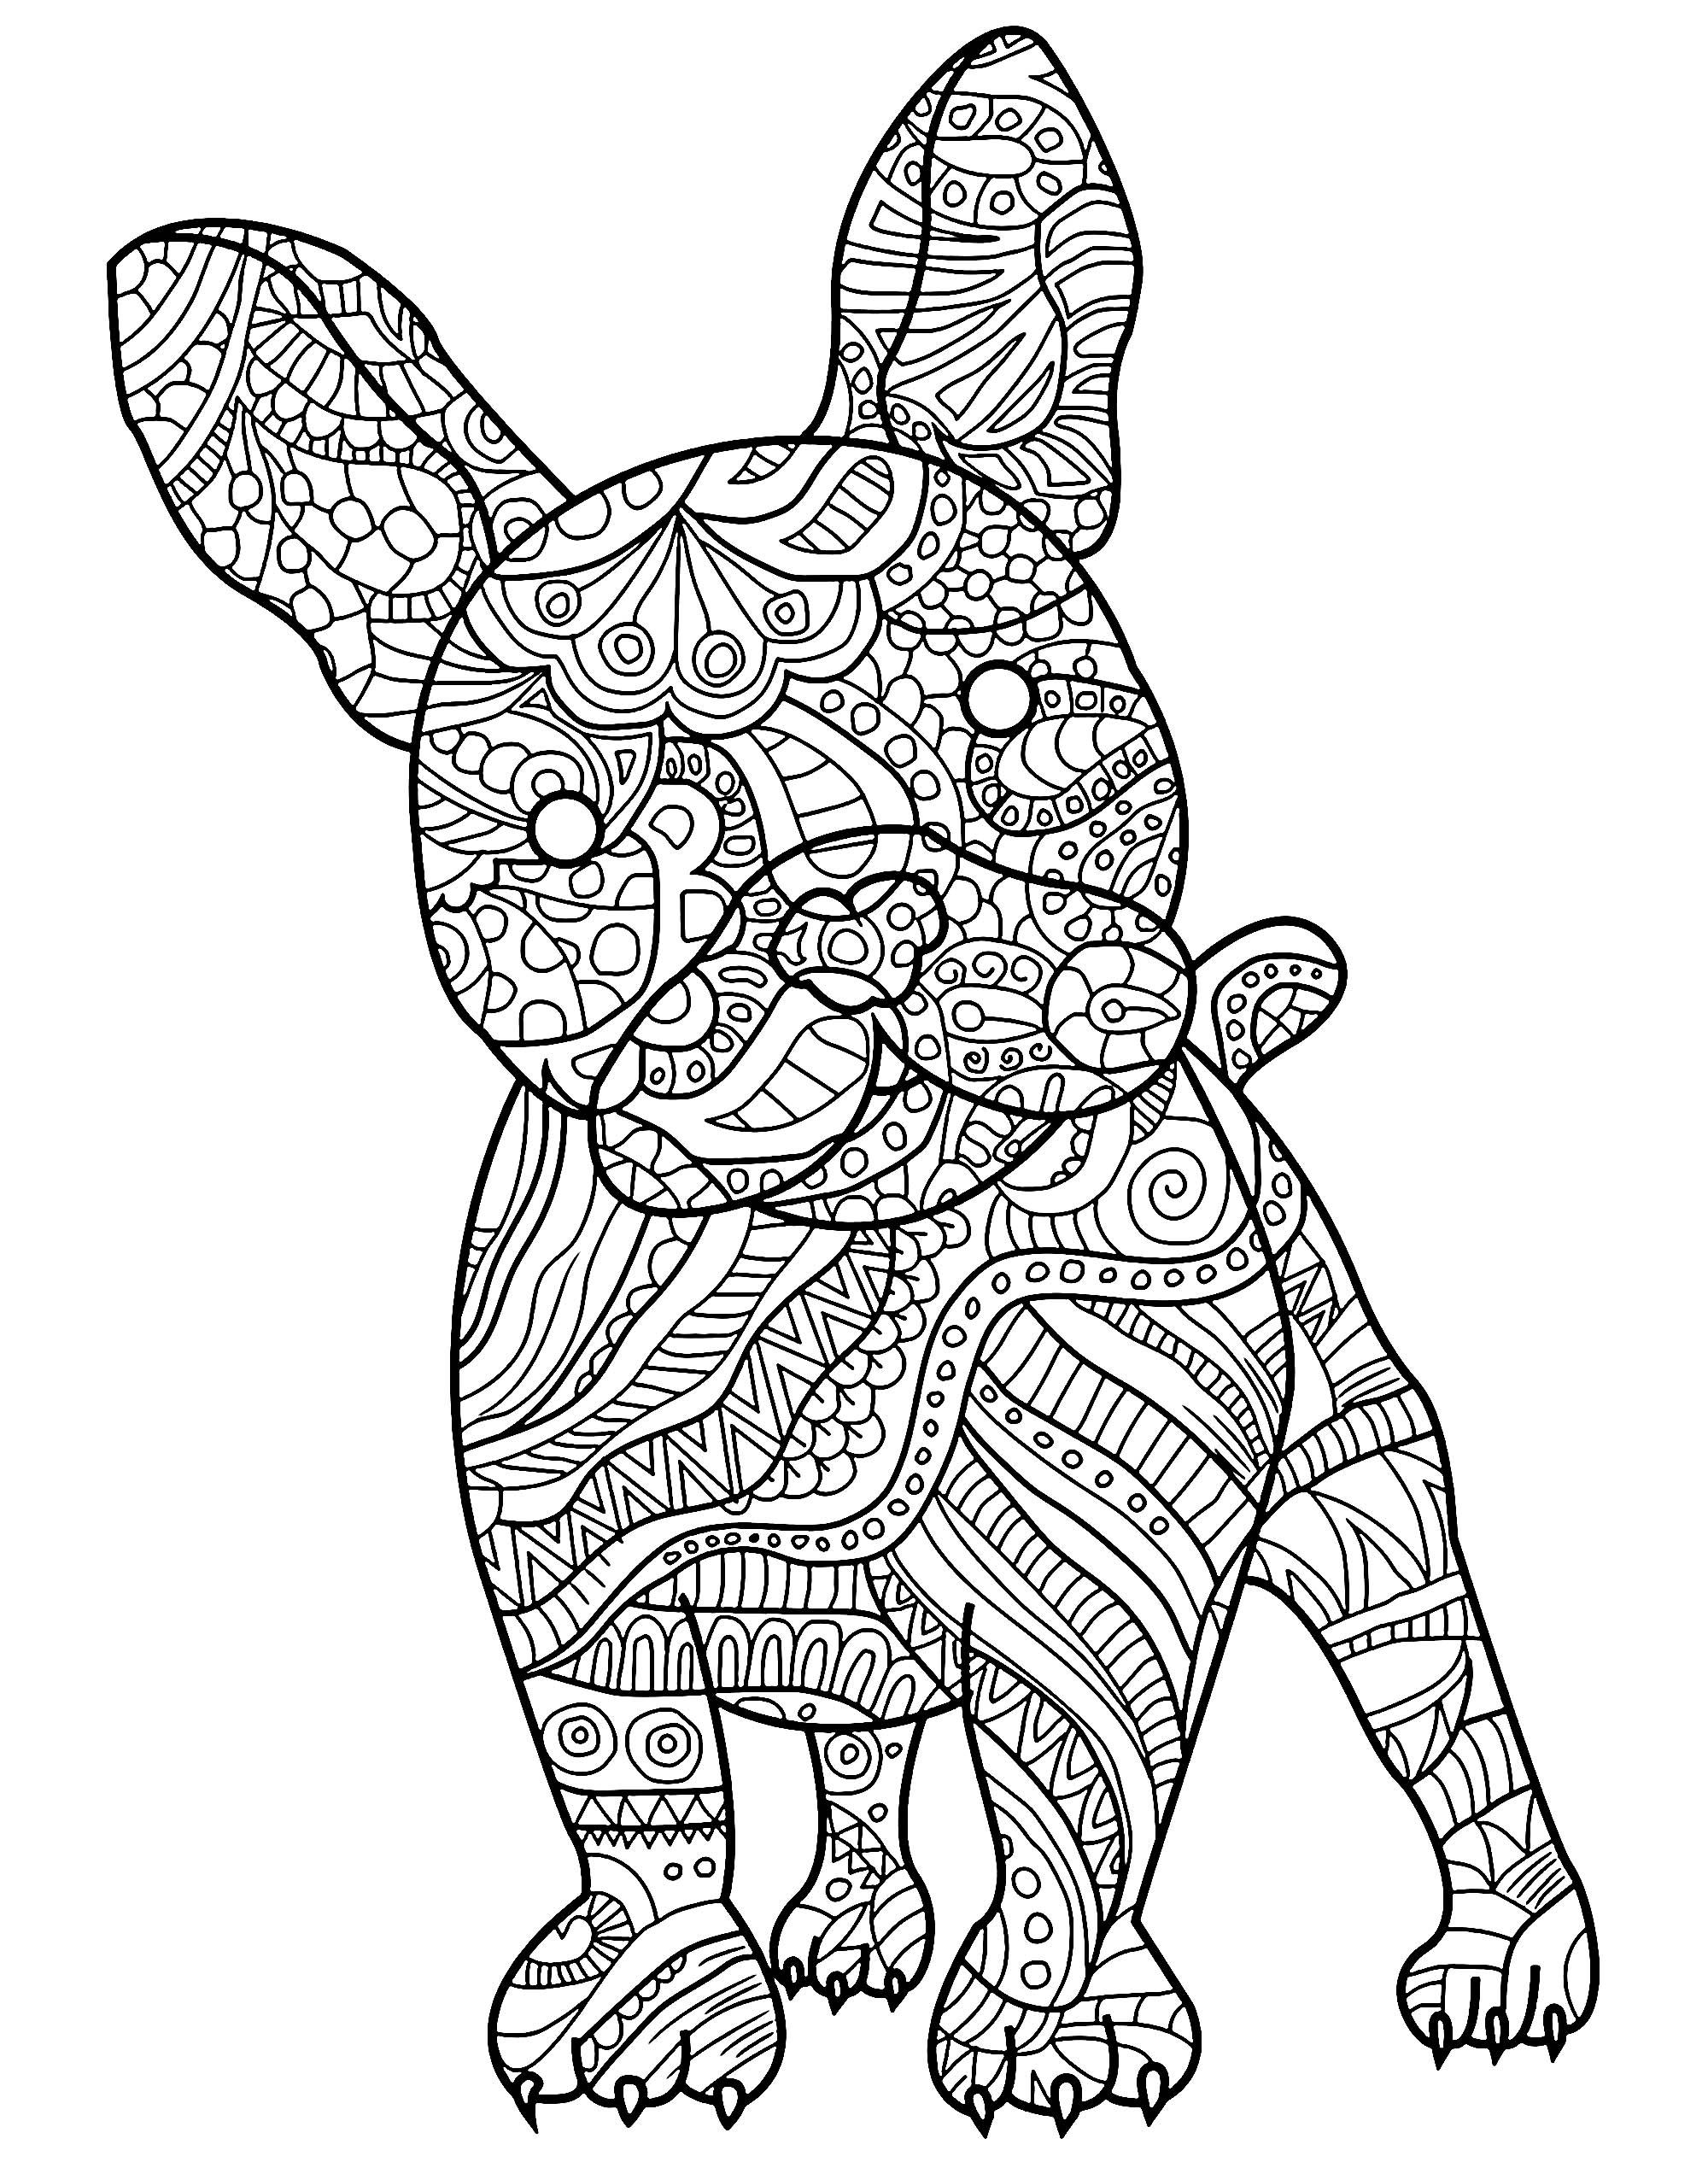 free coloring pages dog kleurplaten dieren tekeningen dieren honden hondjes puppys dog free pages coloring